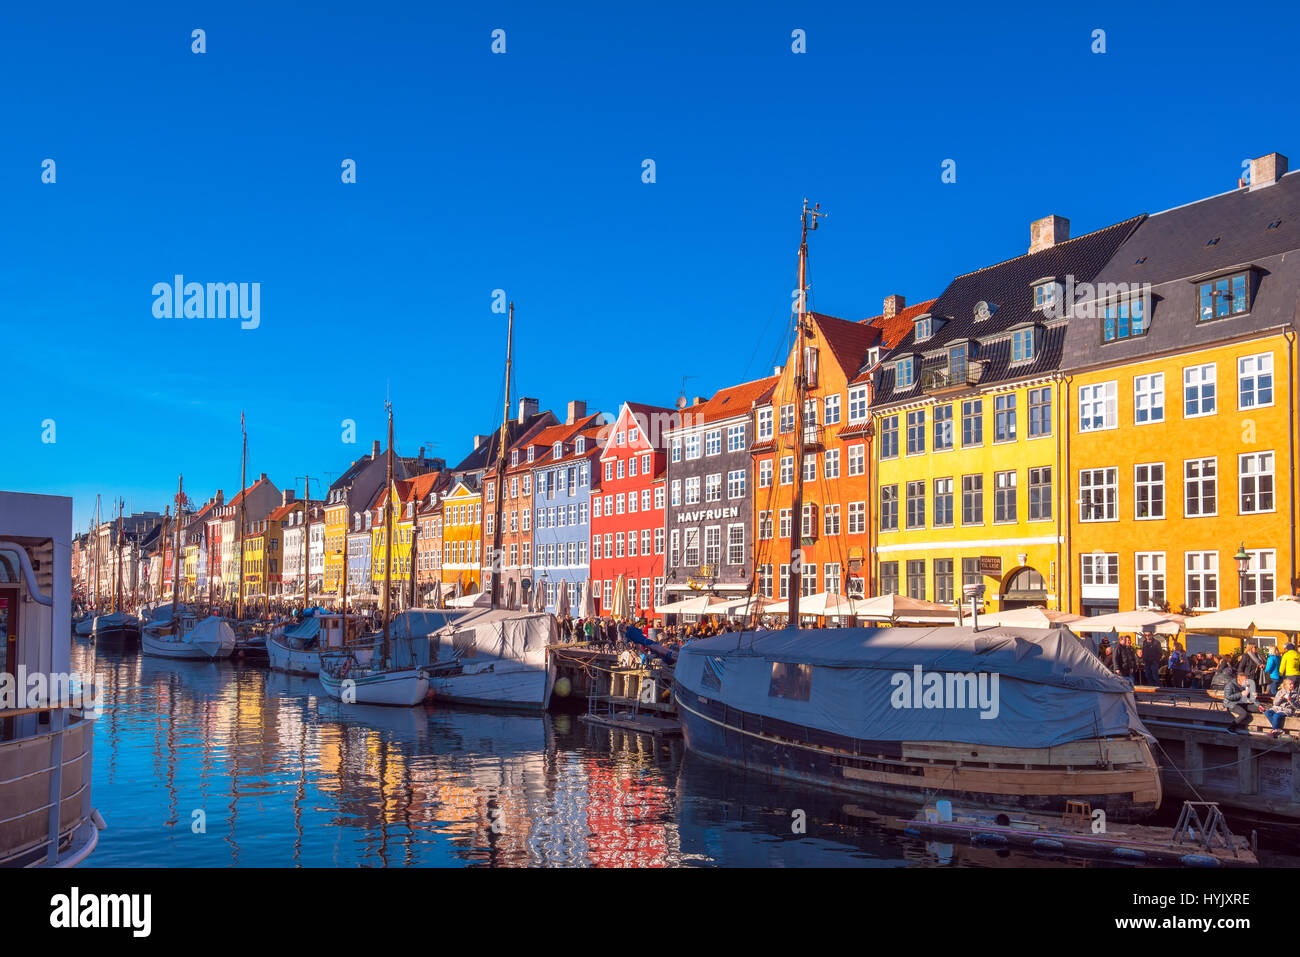 COPENHAGEN, DENMARK - MARCH 11, 2017: Copenhagen Nyhavn canal and promenade with its colorful facades, 17th century Stock Photo